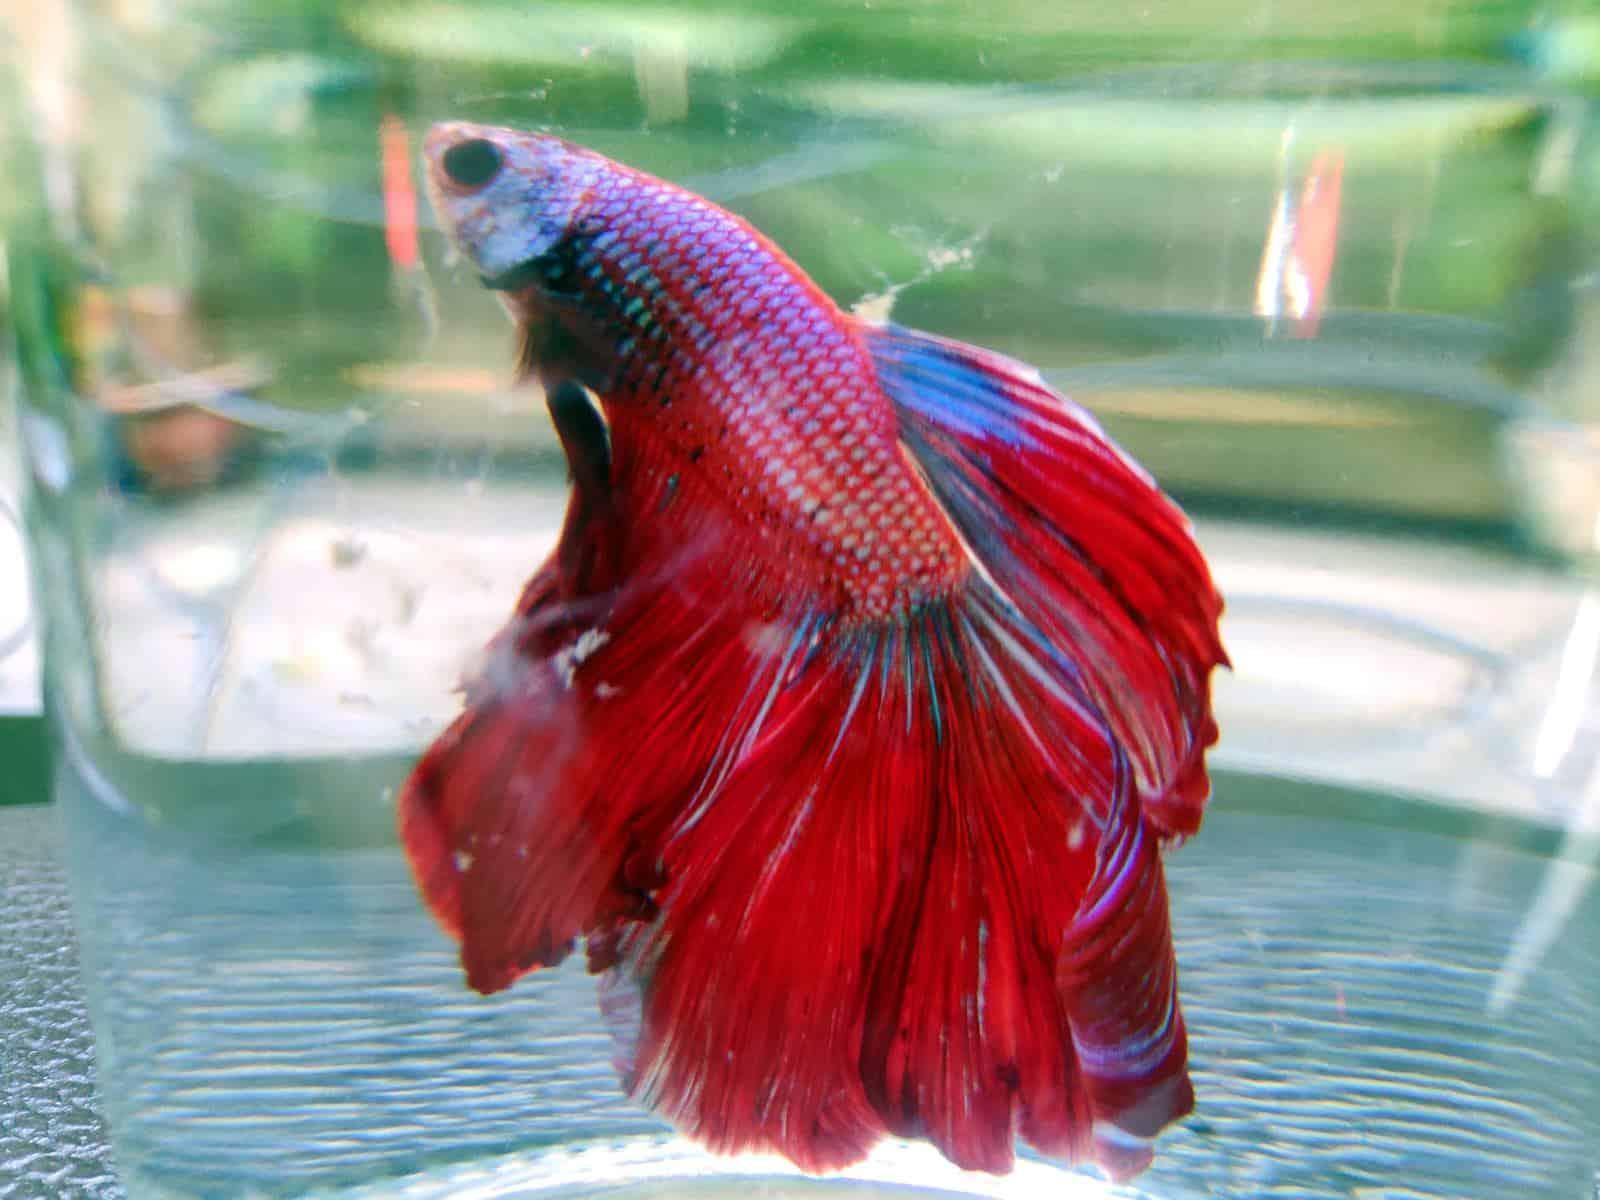 betta fish with popeye in fish bowl